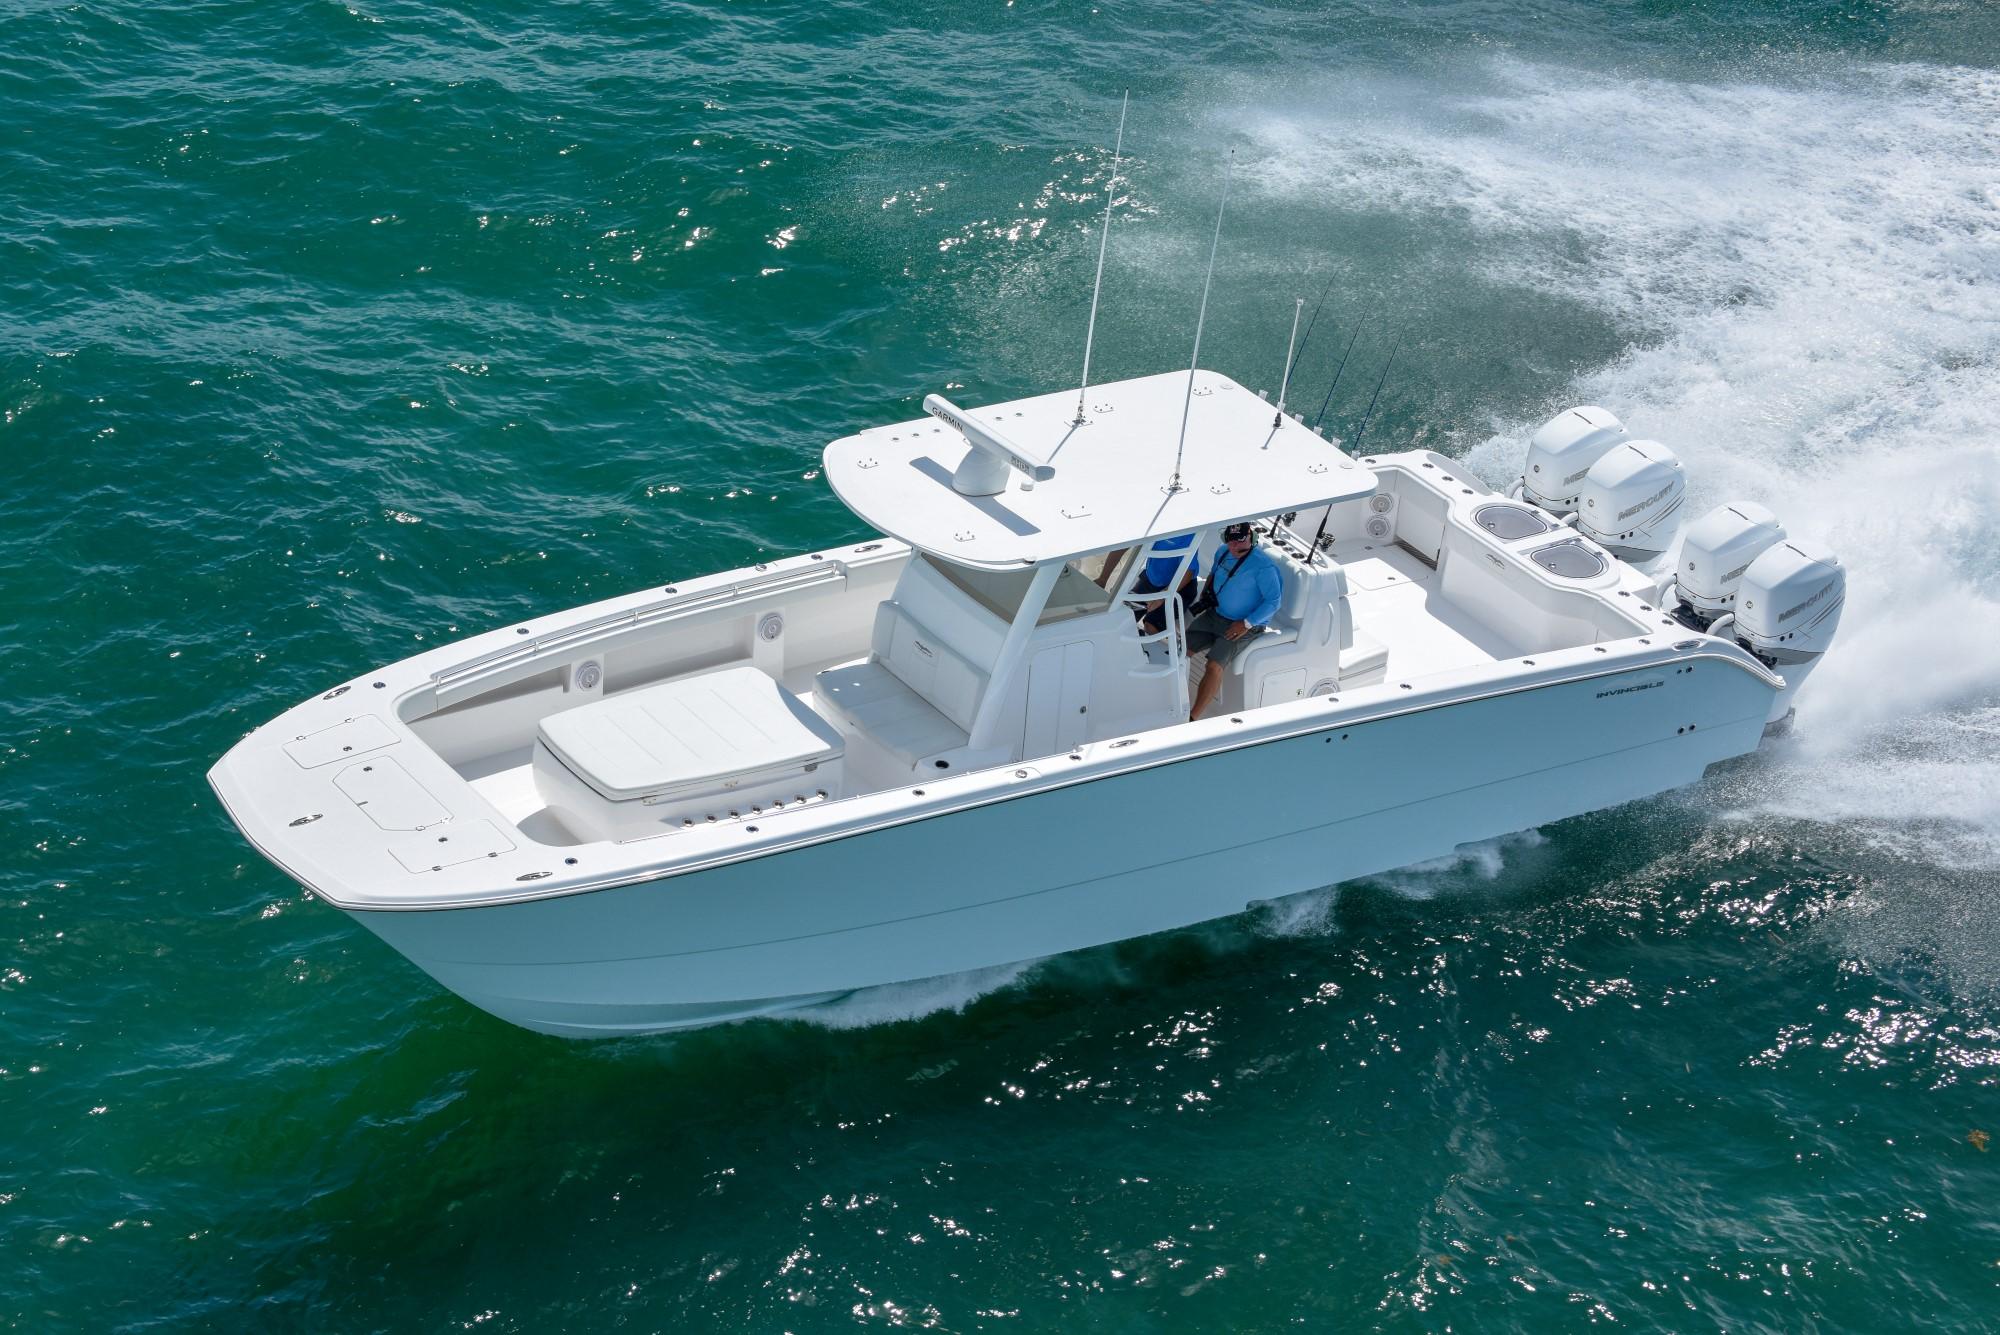 Invincible 40 Catamaran